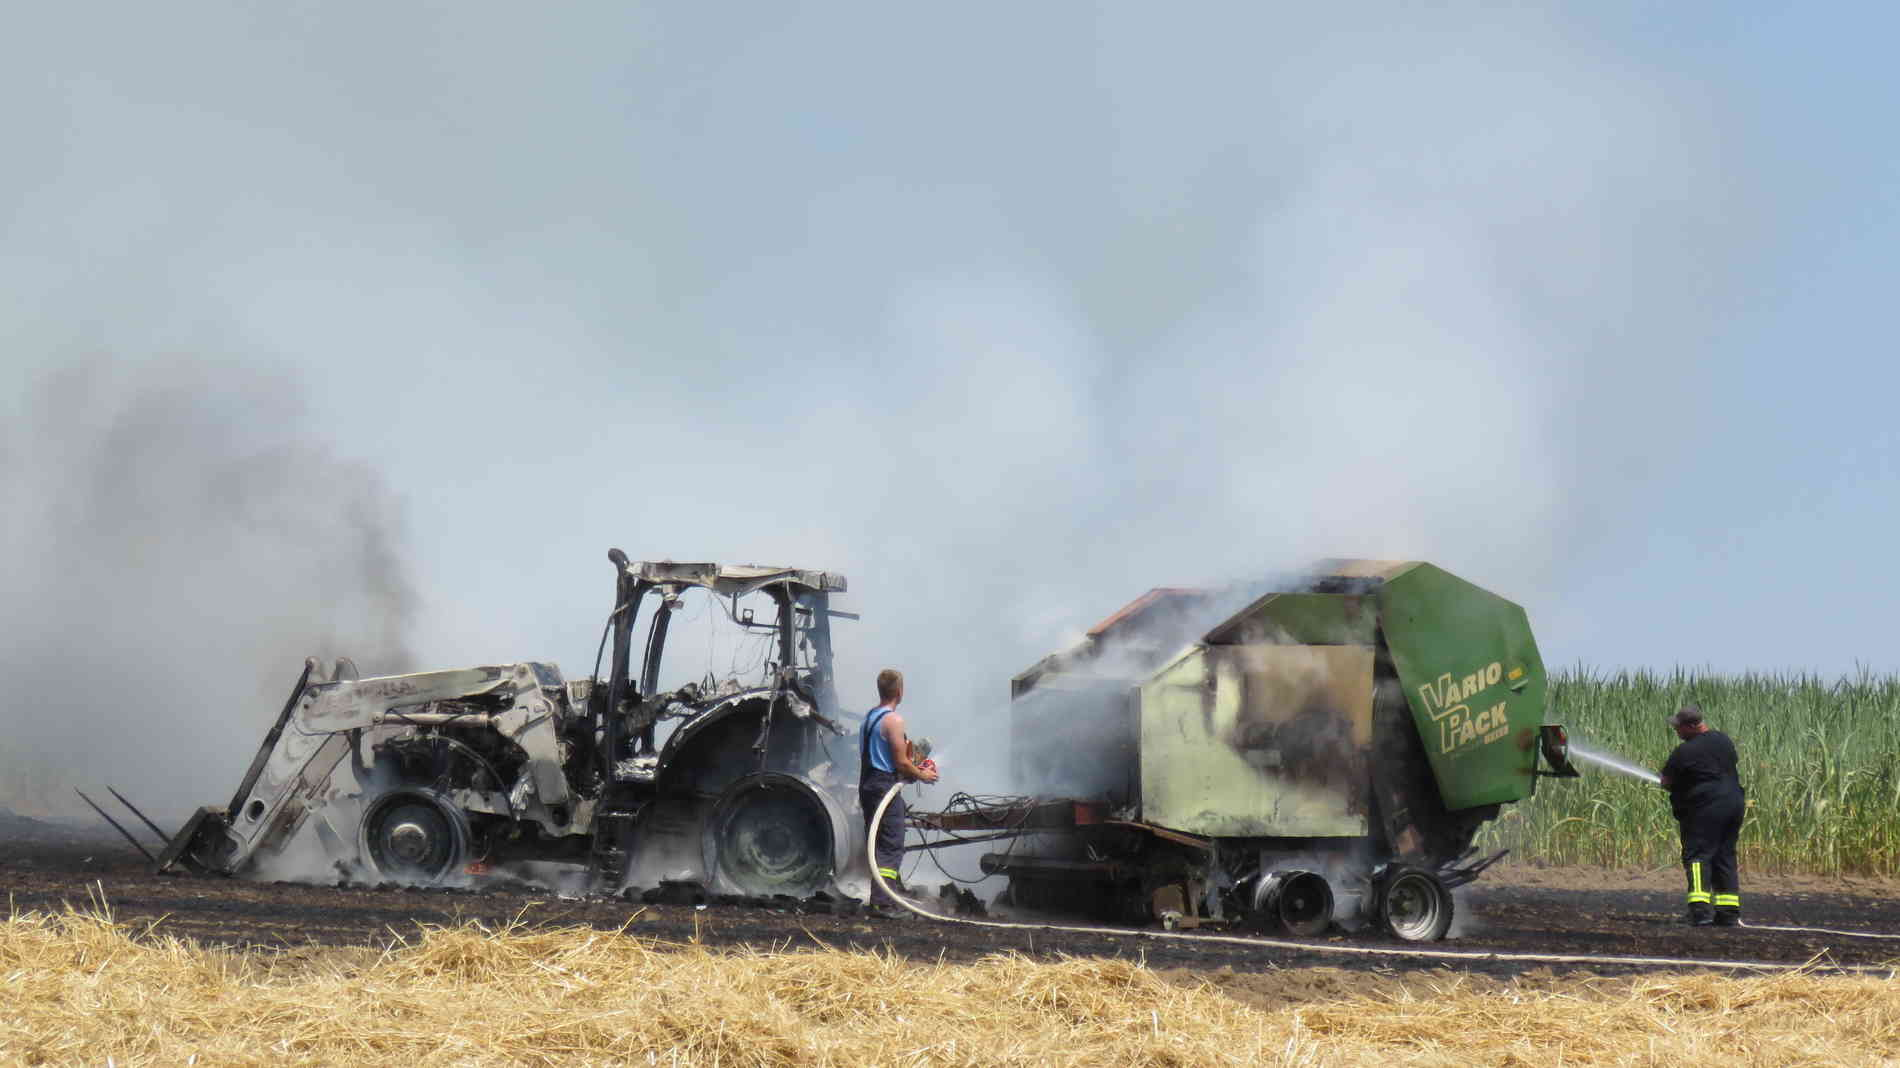 Berühmt Brand: Heuballenpressen lösen Flächenbrände aus - Zwei Traktoren #FE_93